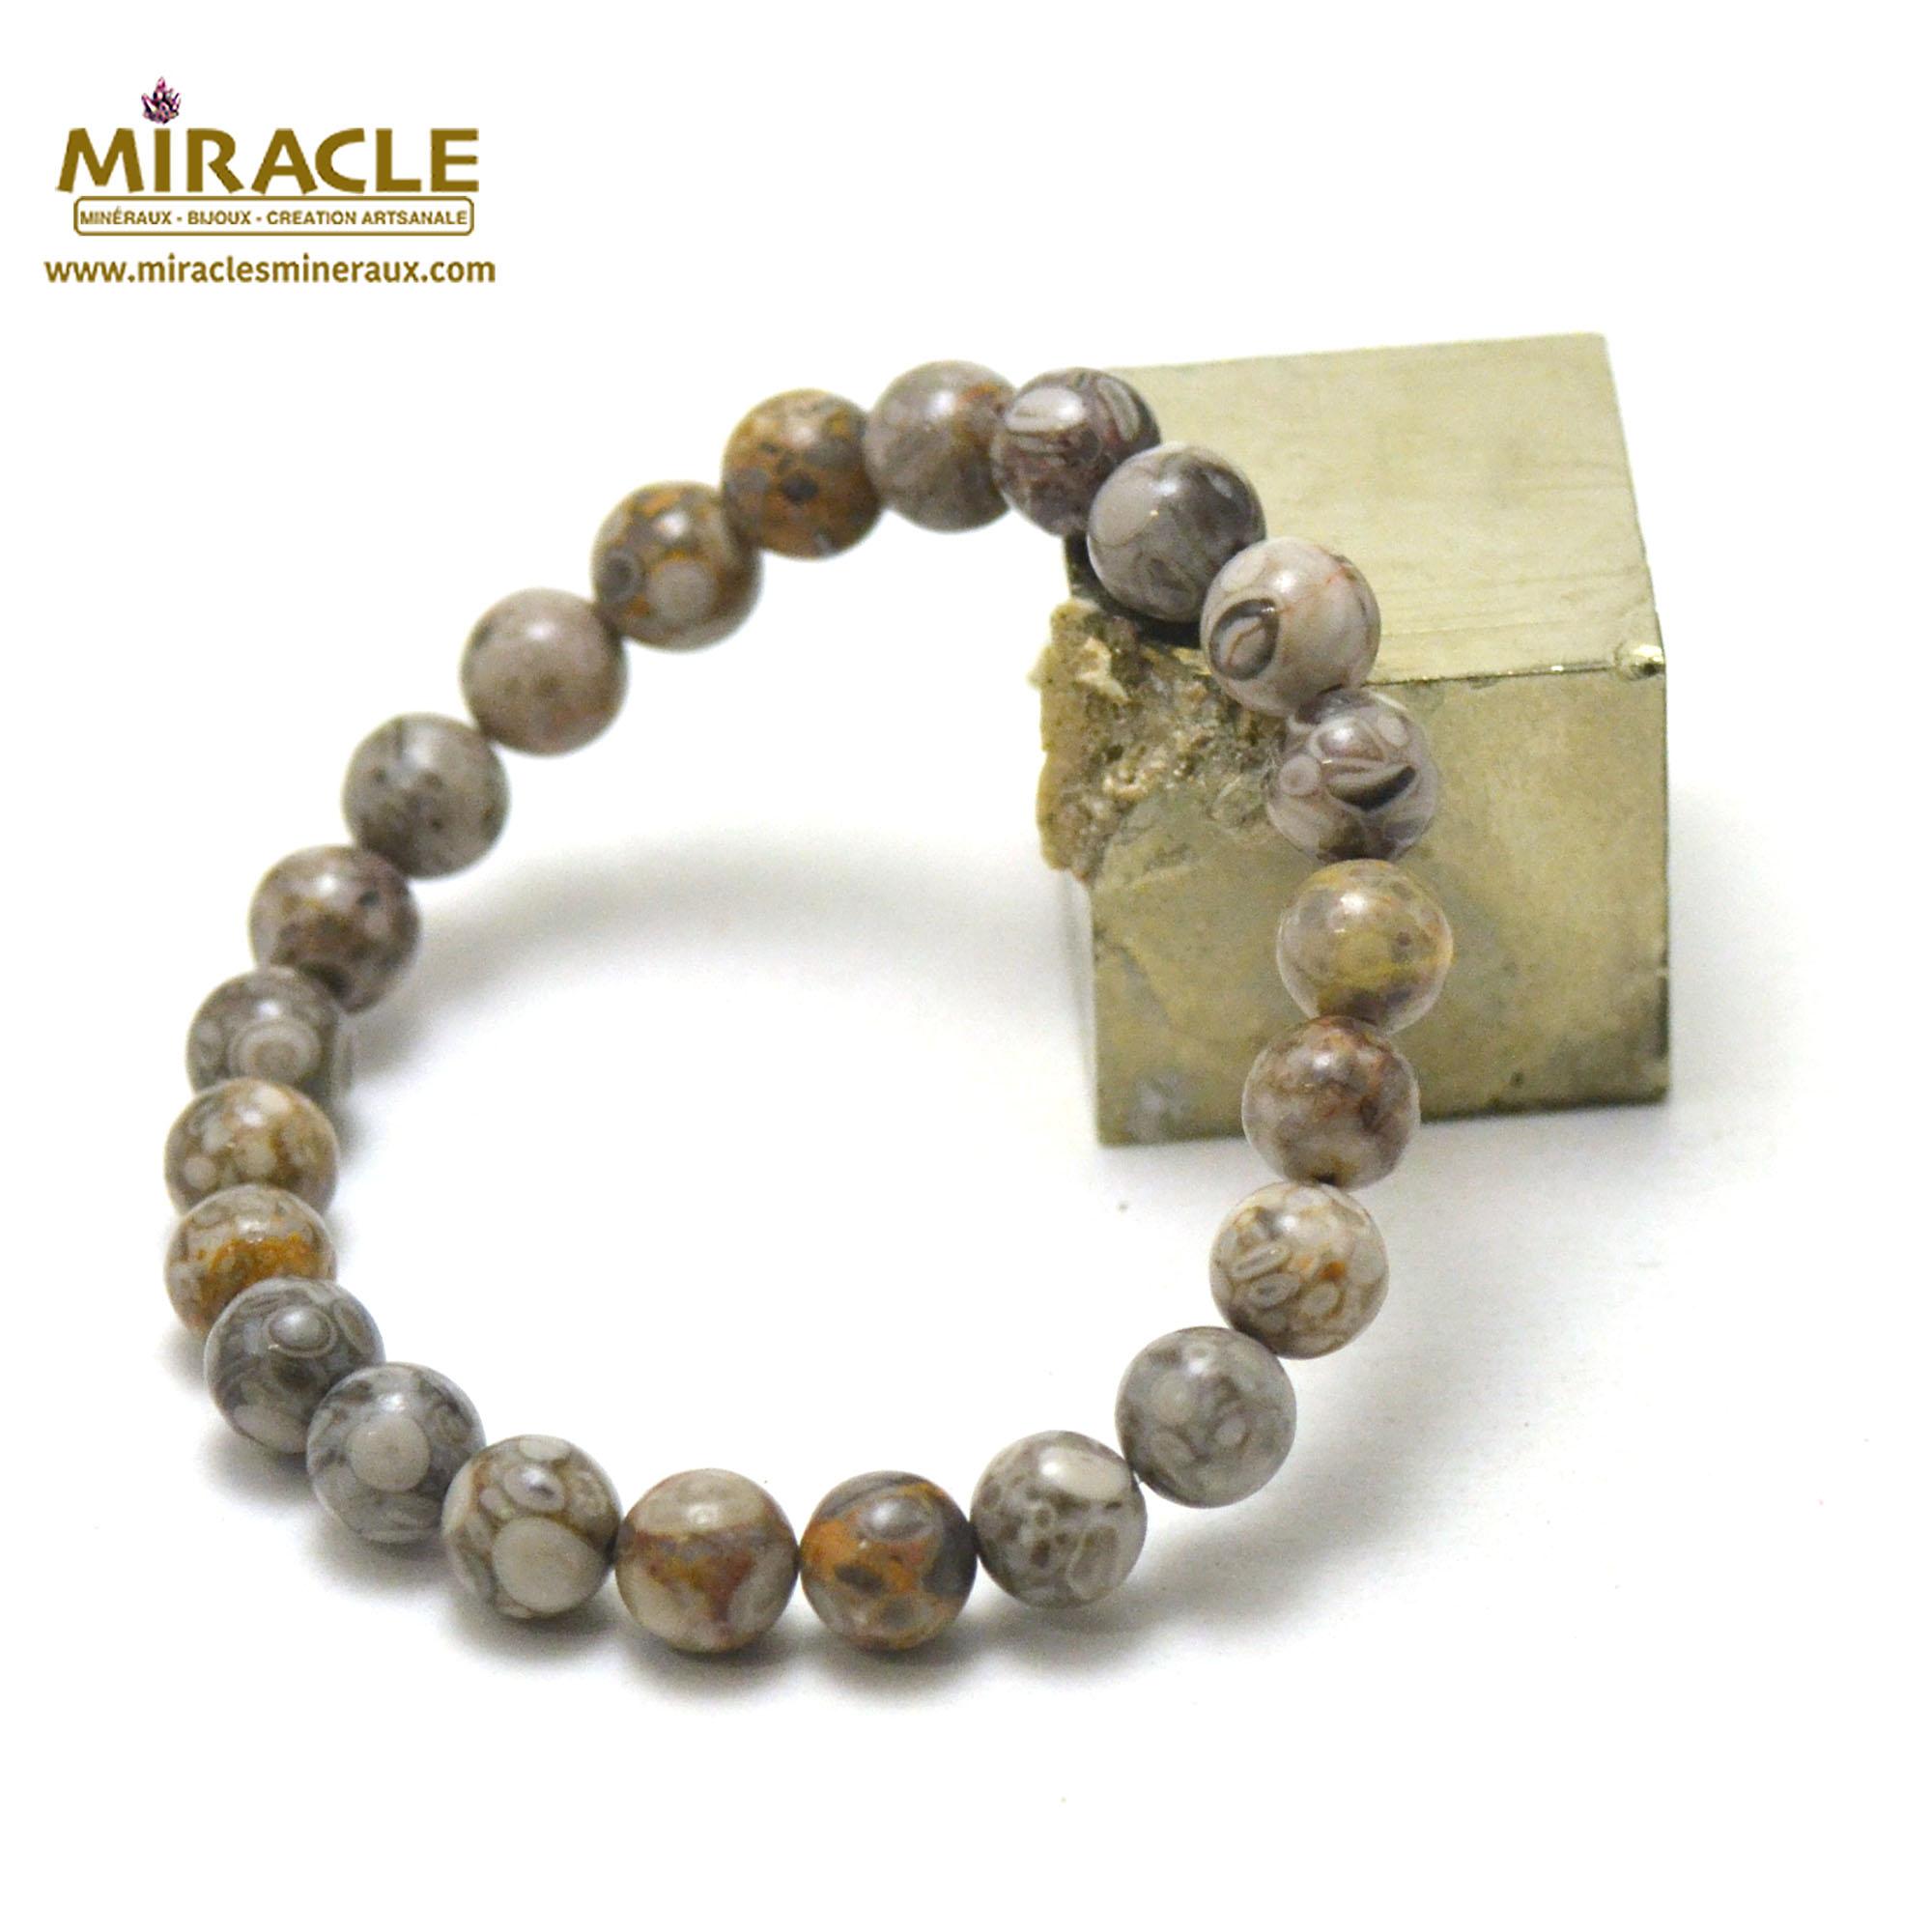 Bracelet agate fossile ou turitelle, perles rond 8 mm